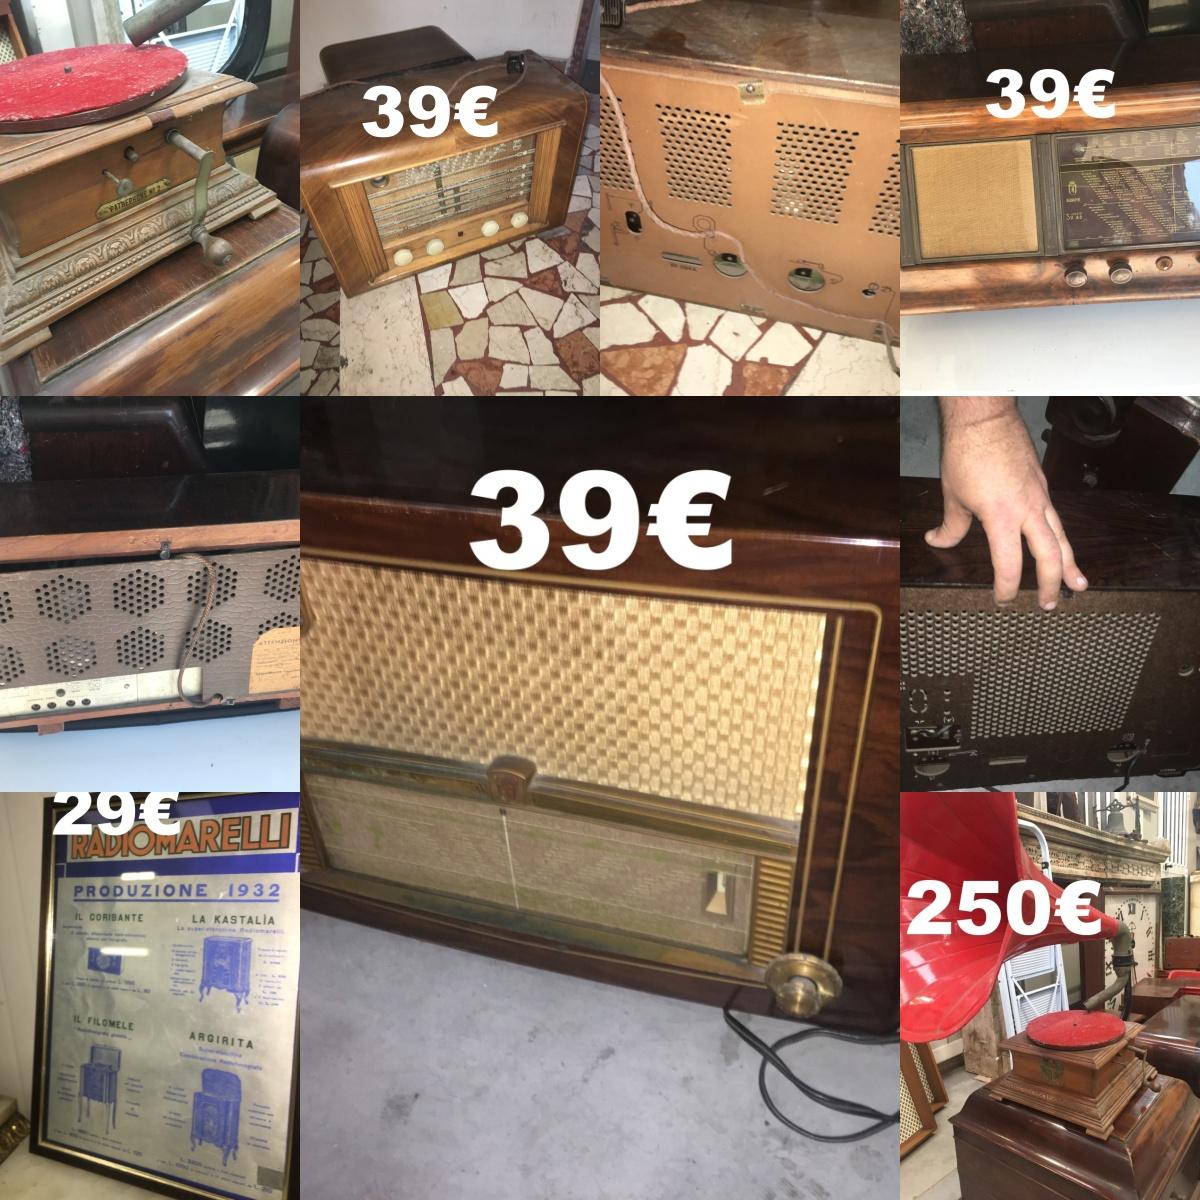 AAA Ultimi ribassi radio e grammofoni prezzi zero. approfittate